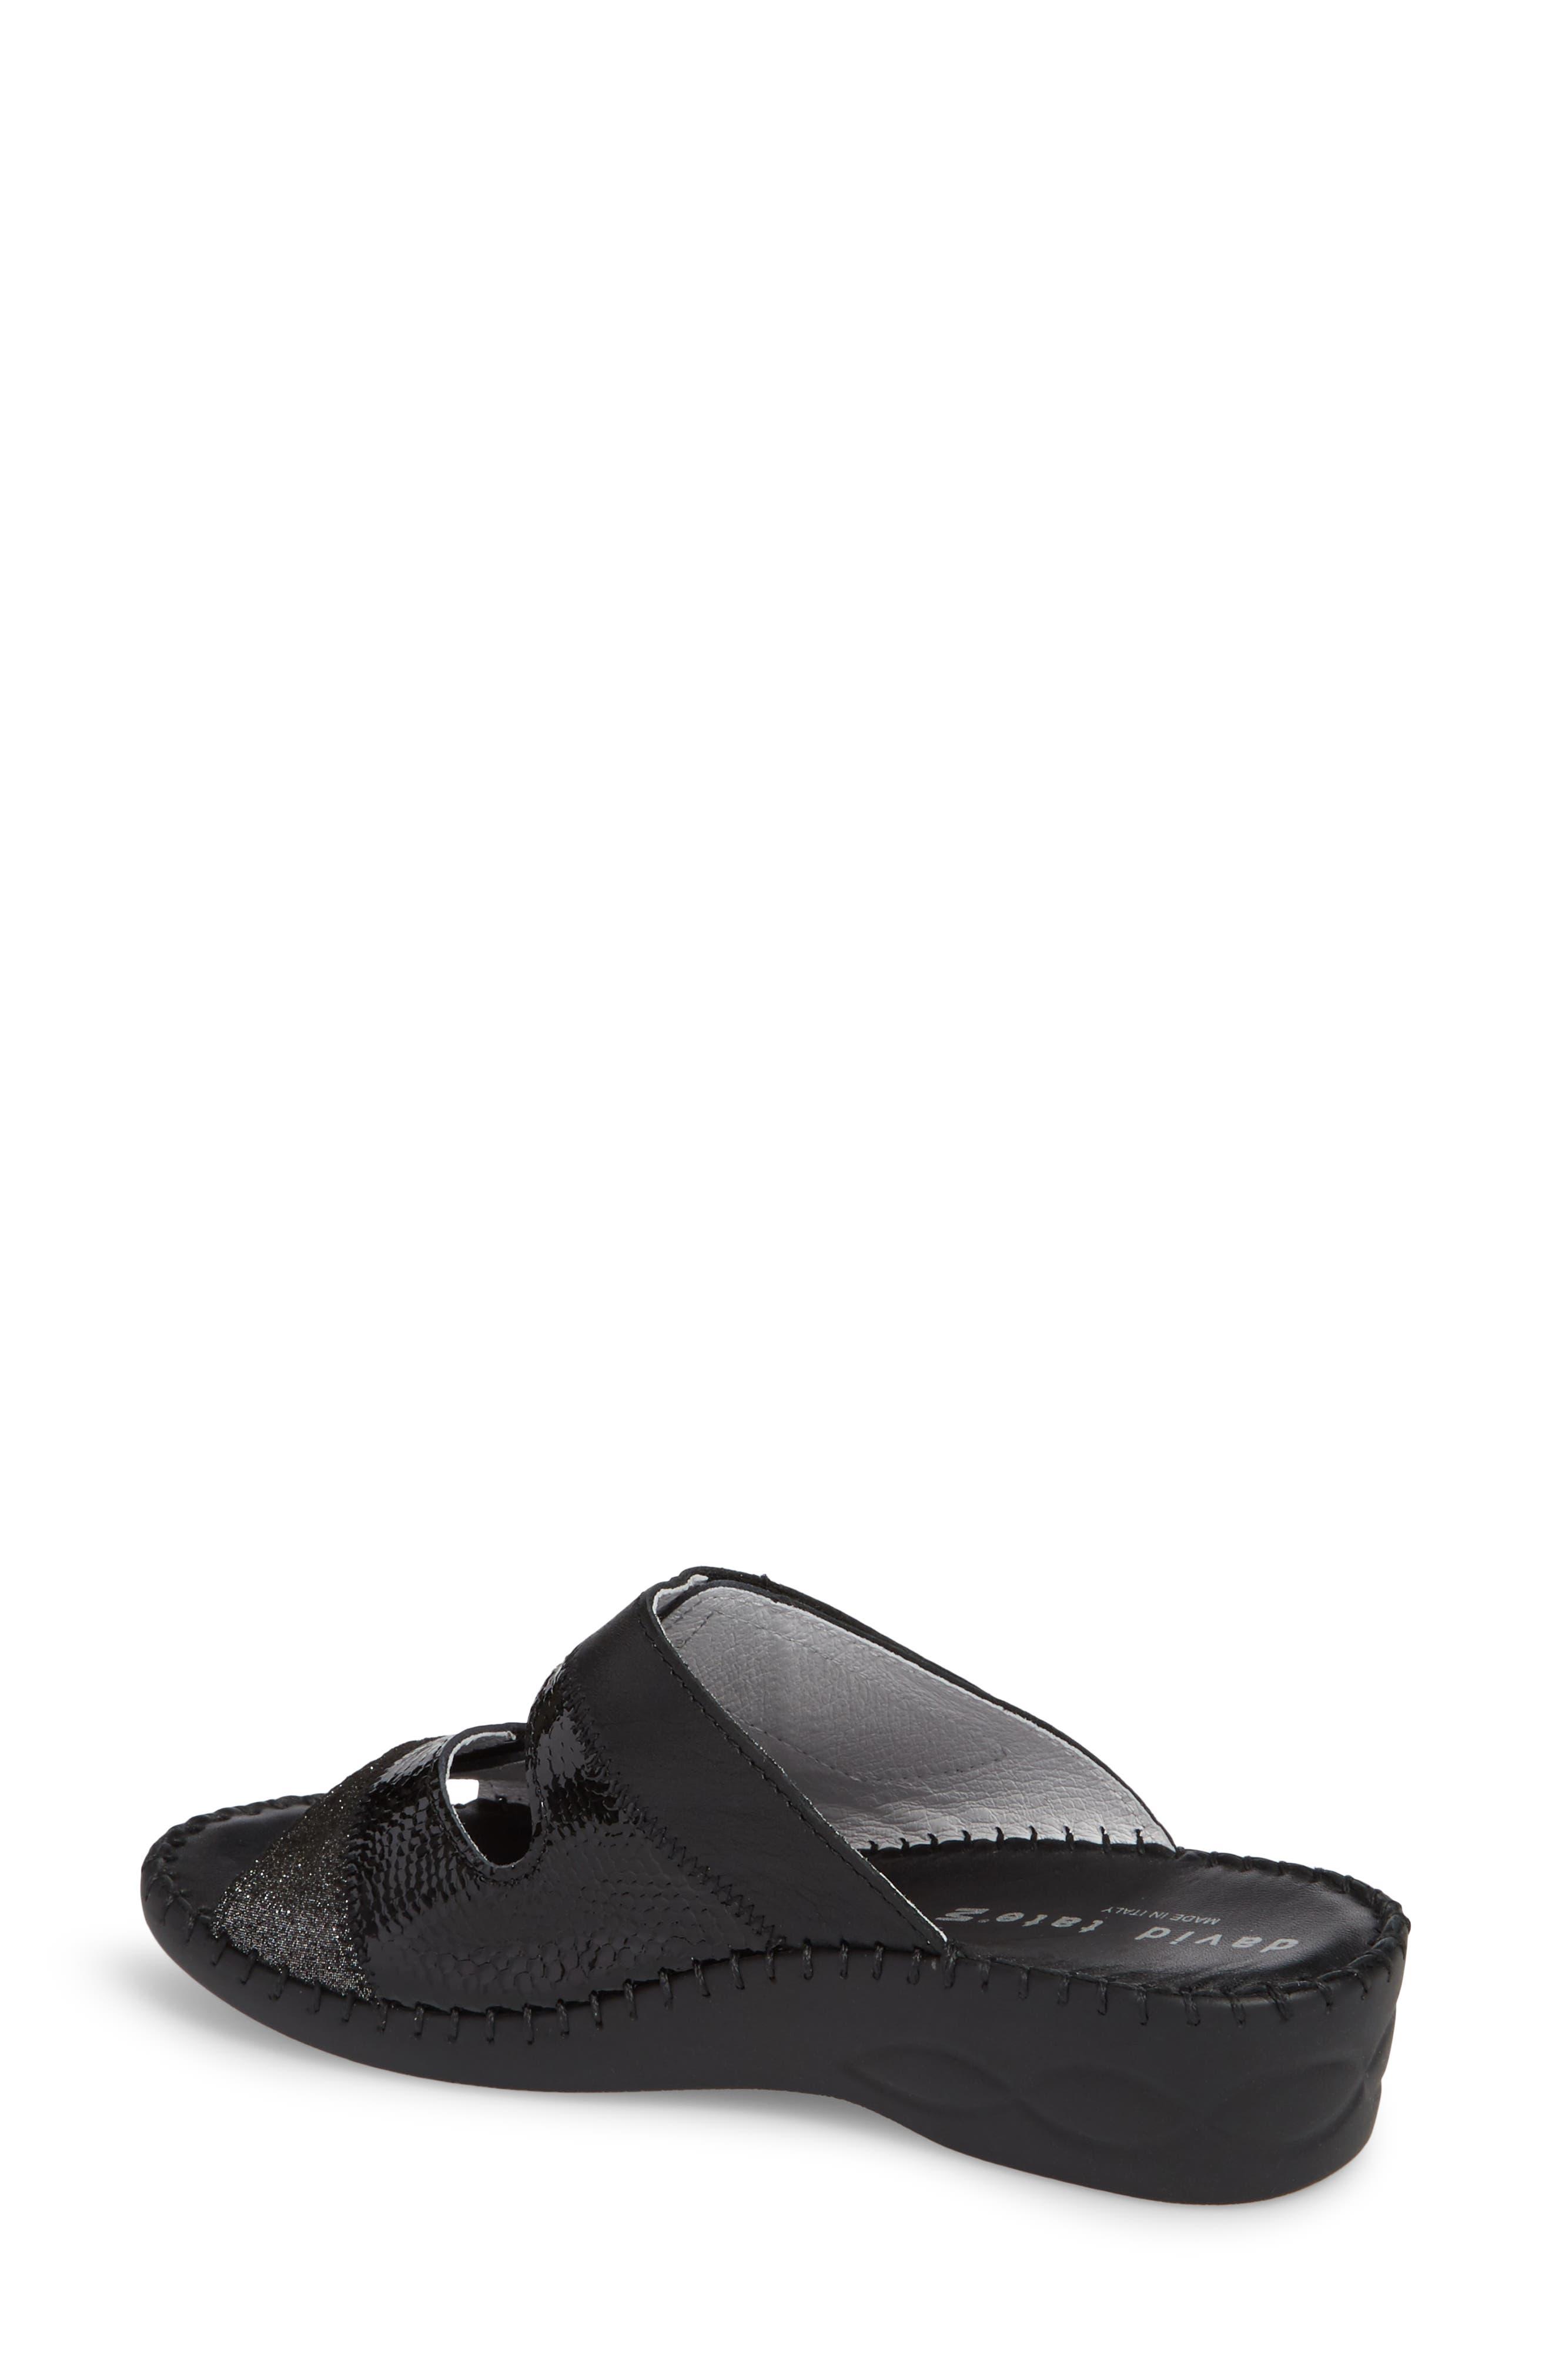 Flex Slide Sandal,                             Alternate thumbnail 2, color,                             BLACK LEATHER